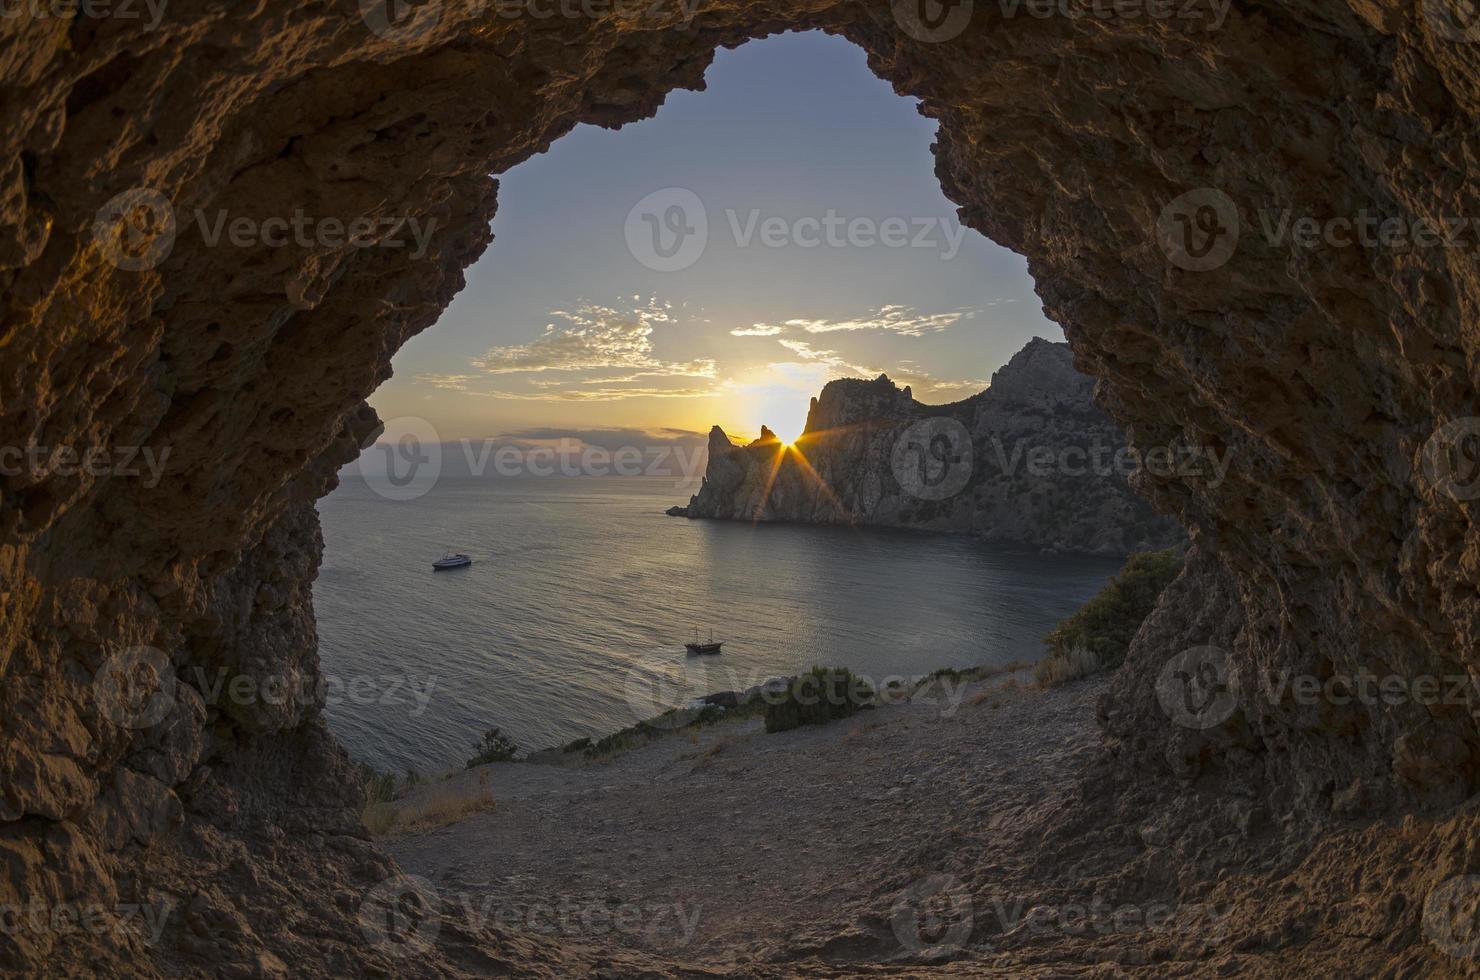 solnedgång bakom kustens klippor. Krim. foto